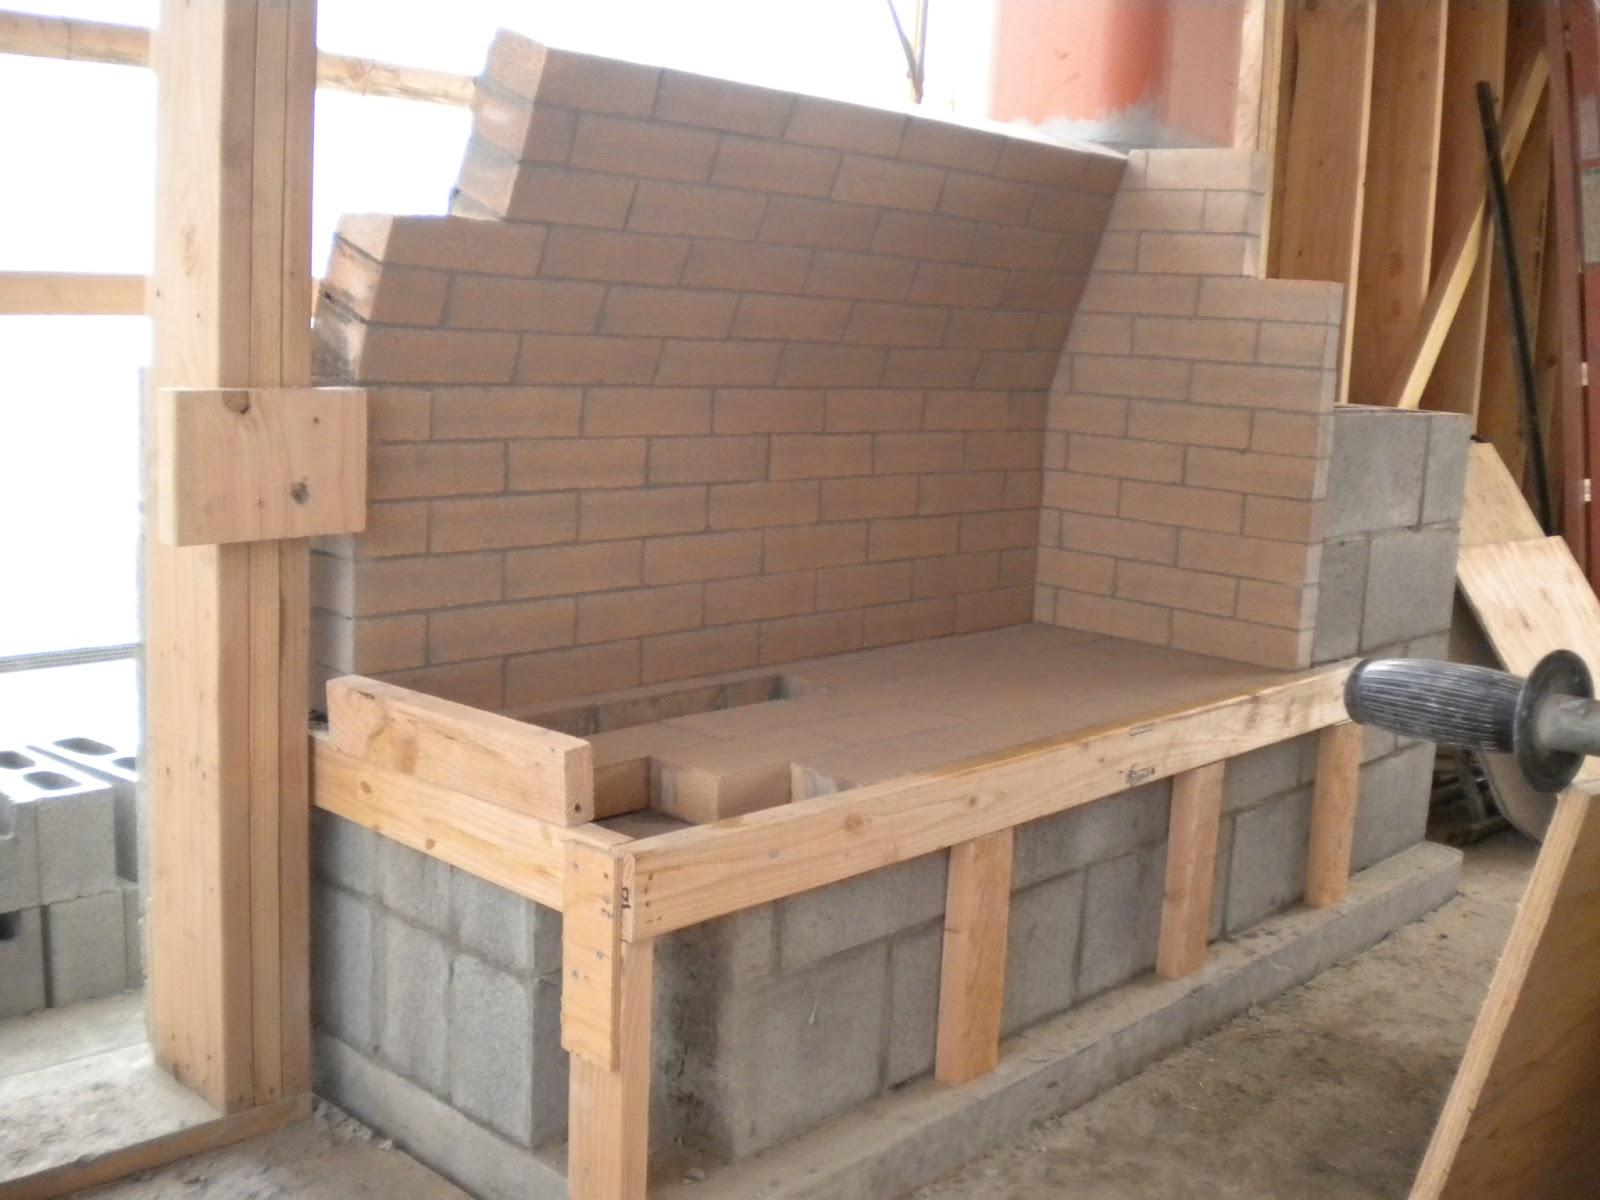 Boisineau Masonry 2nd Floor Fireplace Firebox Angled Walls